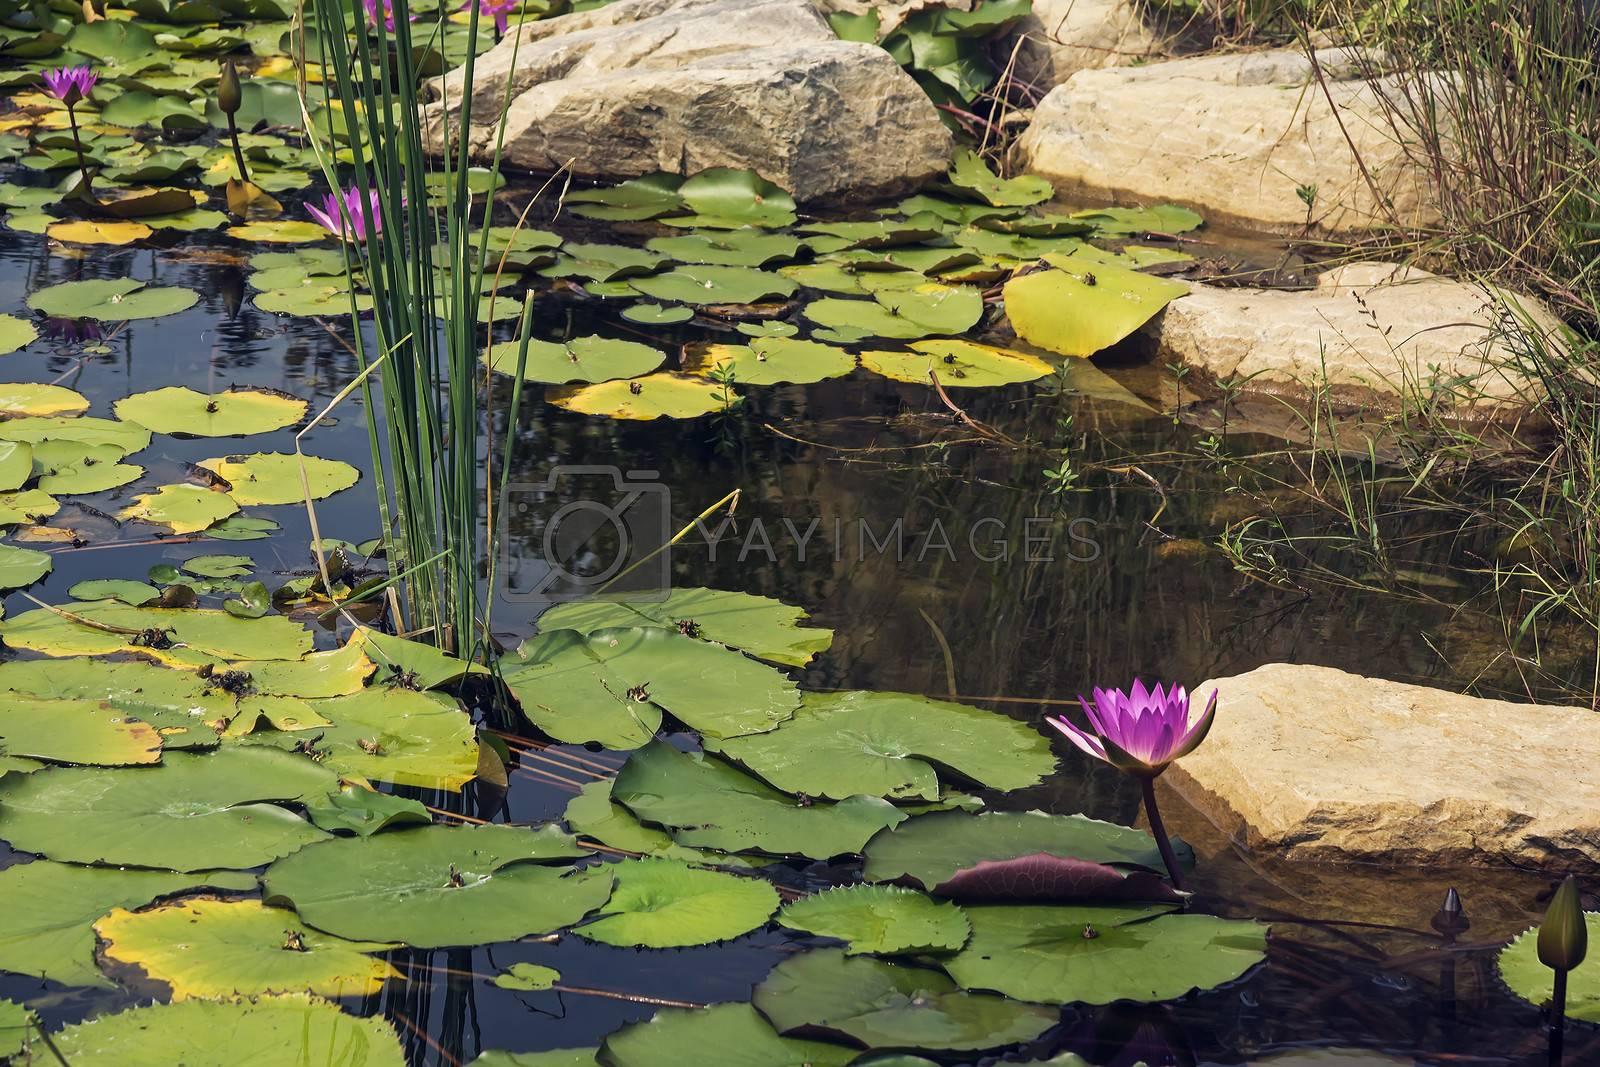 Lotus in full bloom in the pond